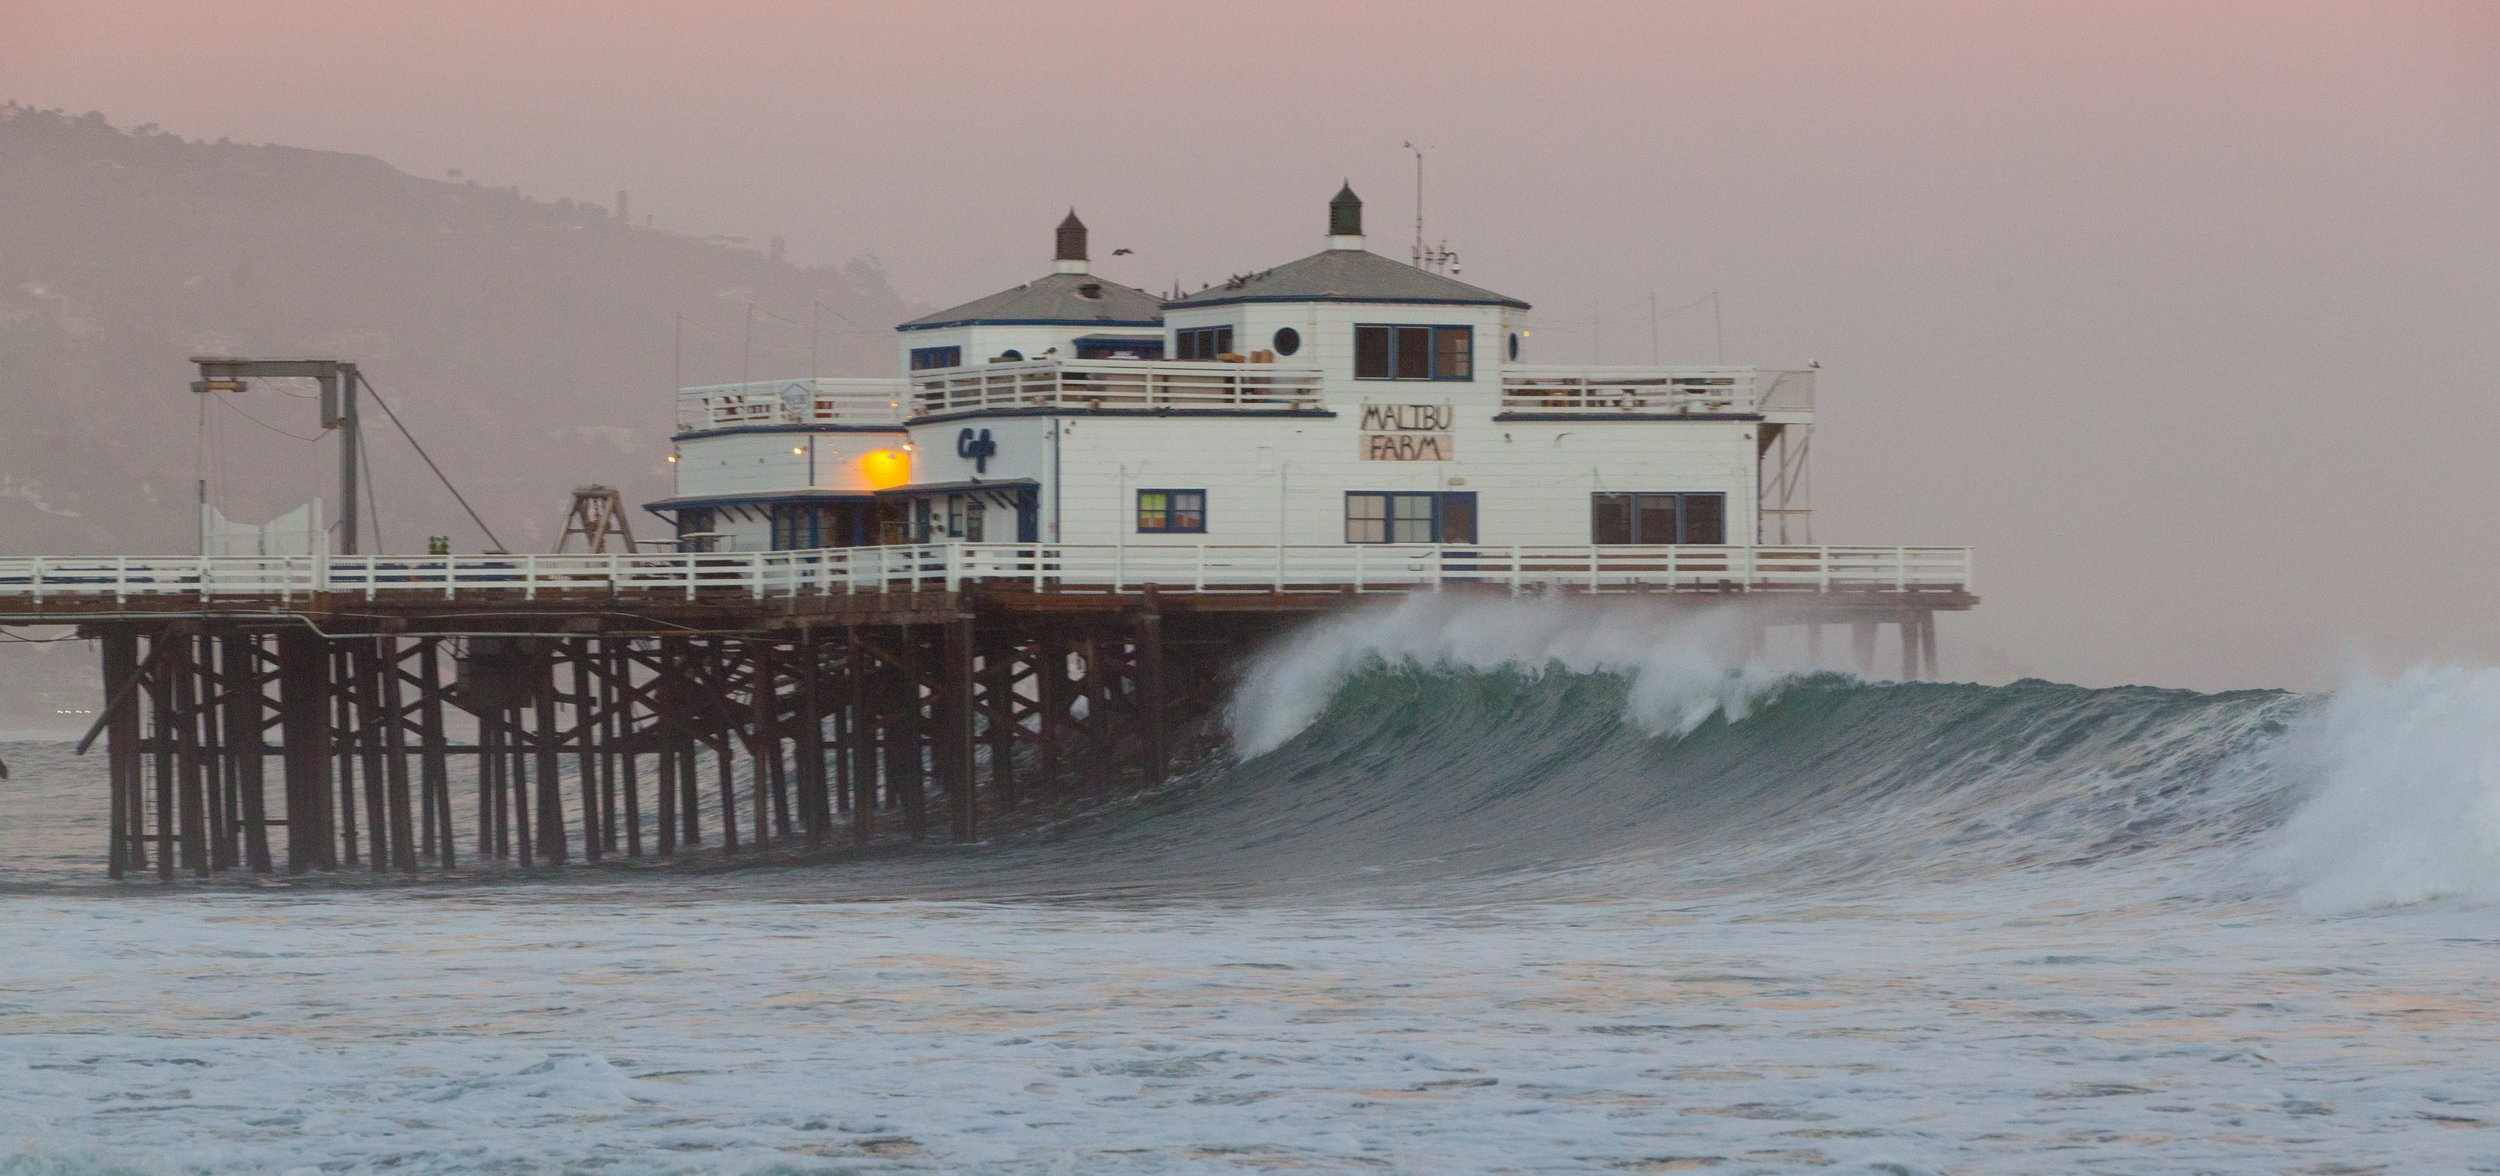 Malibu waves 1 (1 of 1) copy.jpg